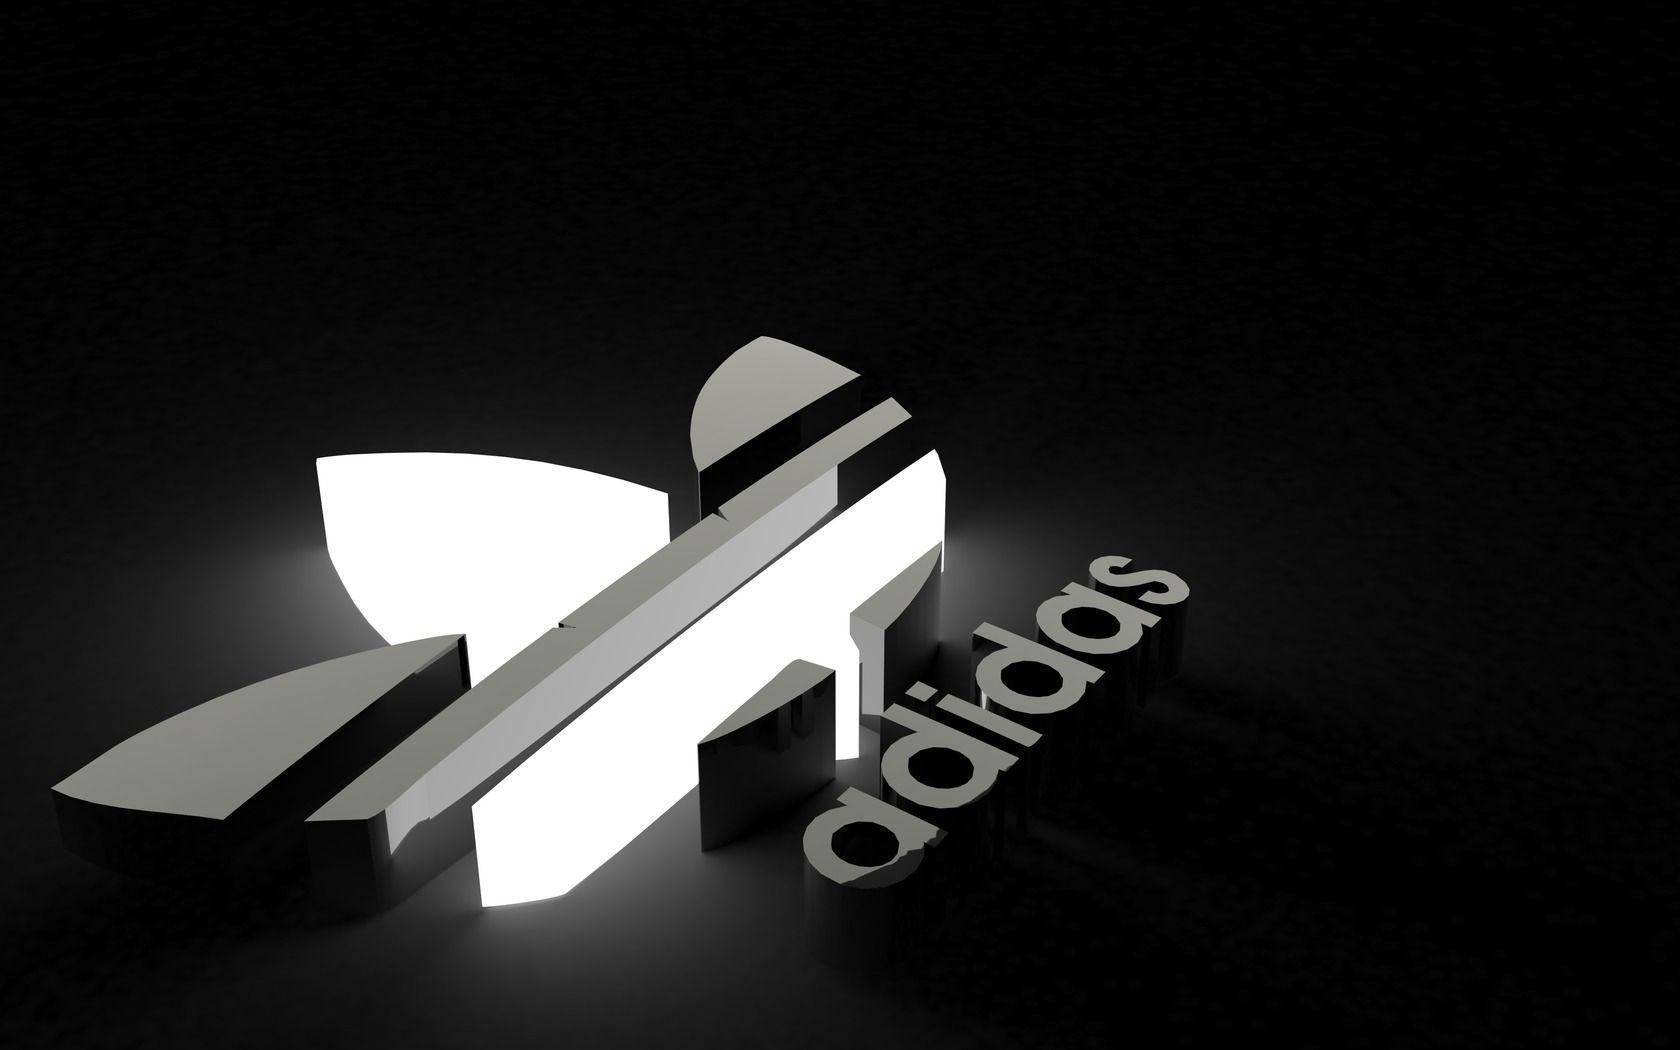 Adidas Logo wallpapers fondos de pantalla cueva 2017